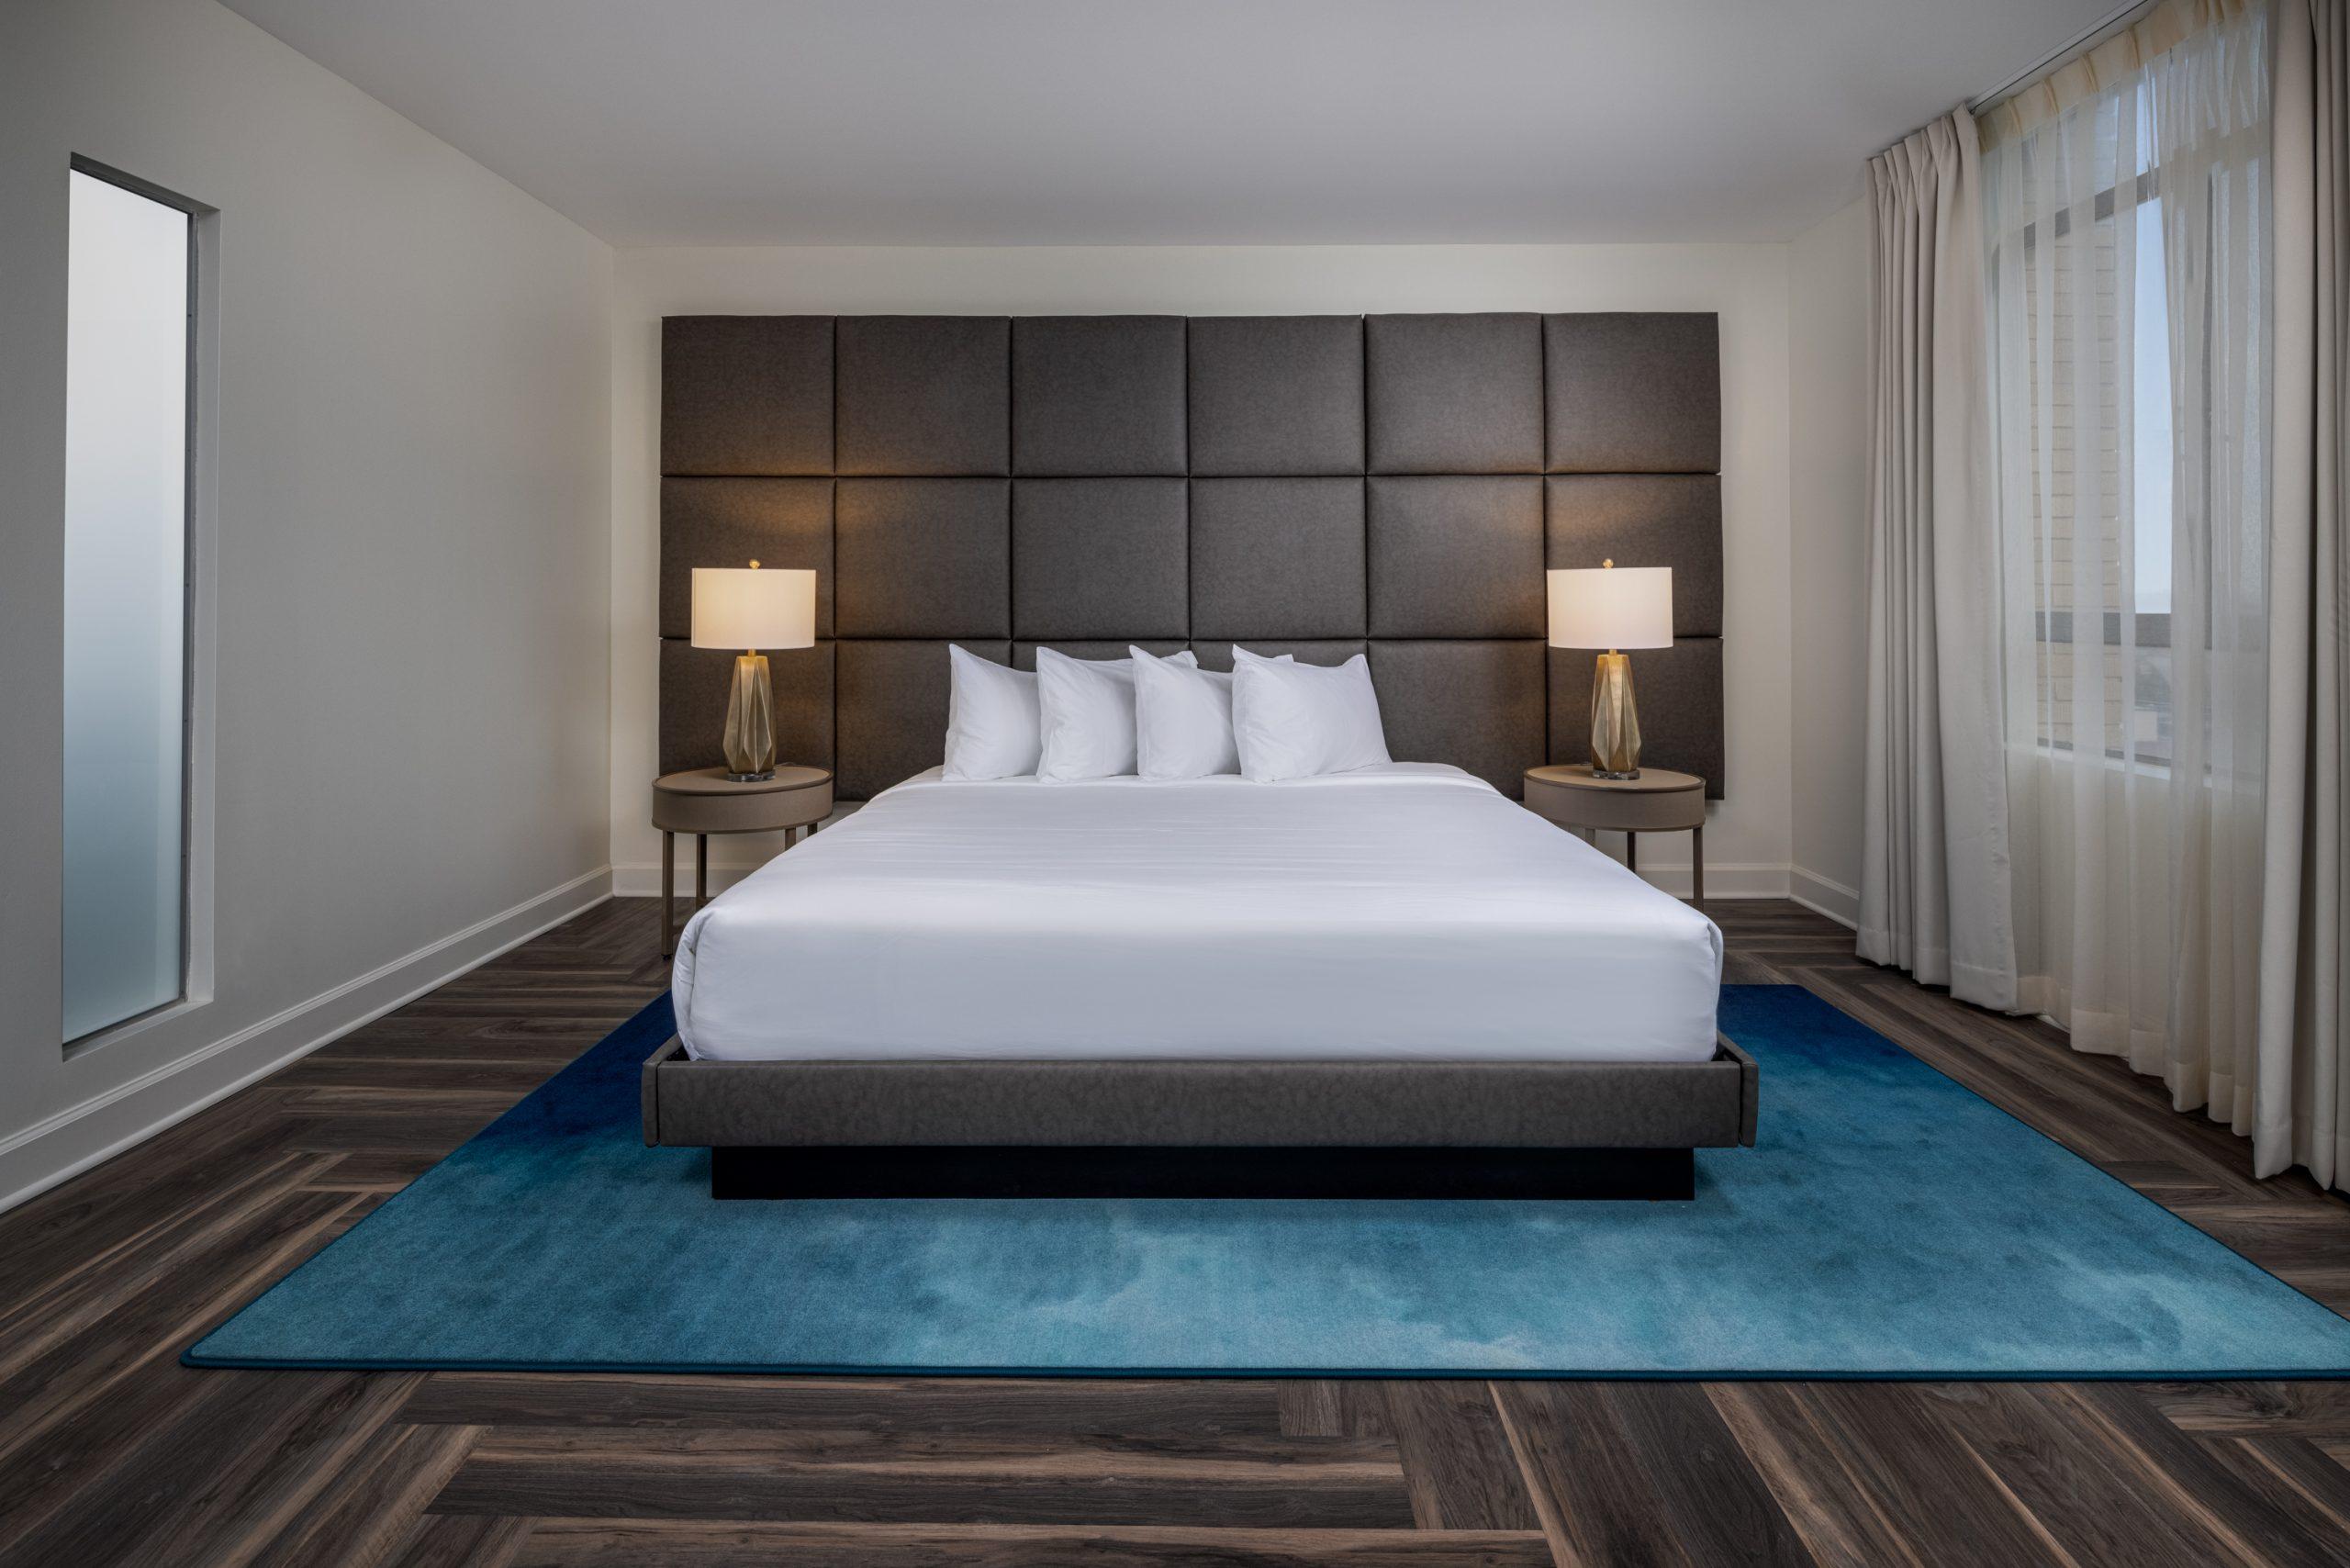 Hotel-Deco-adaking-3b